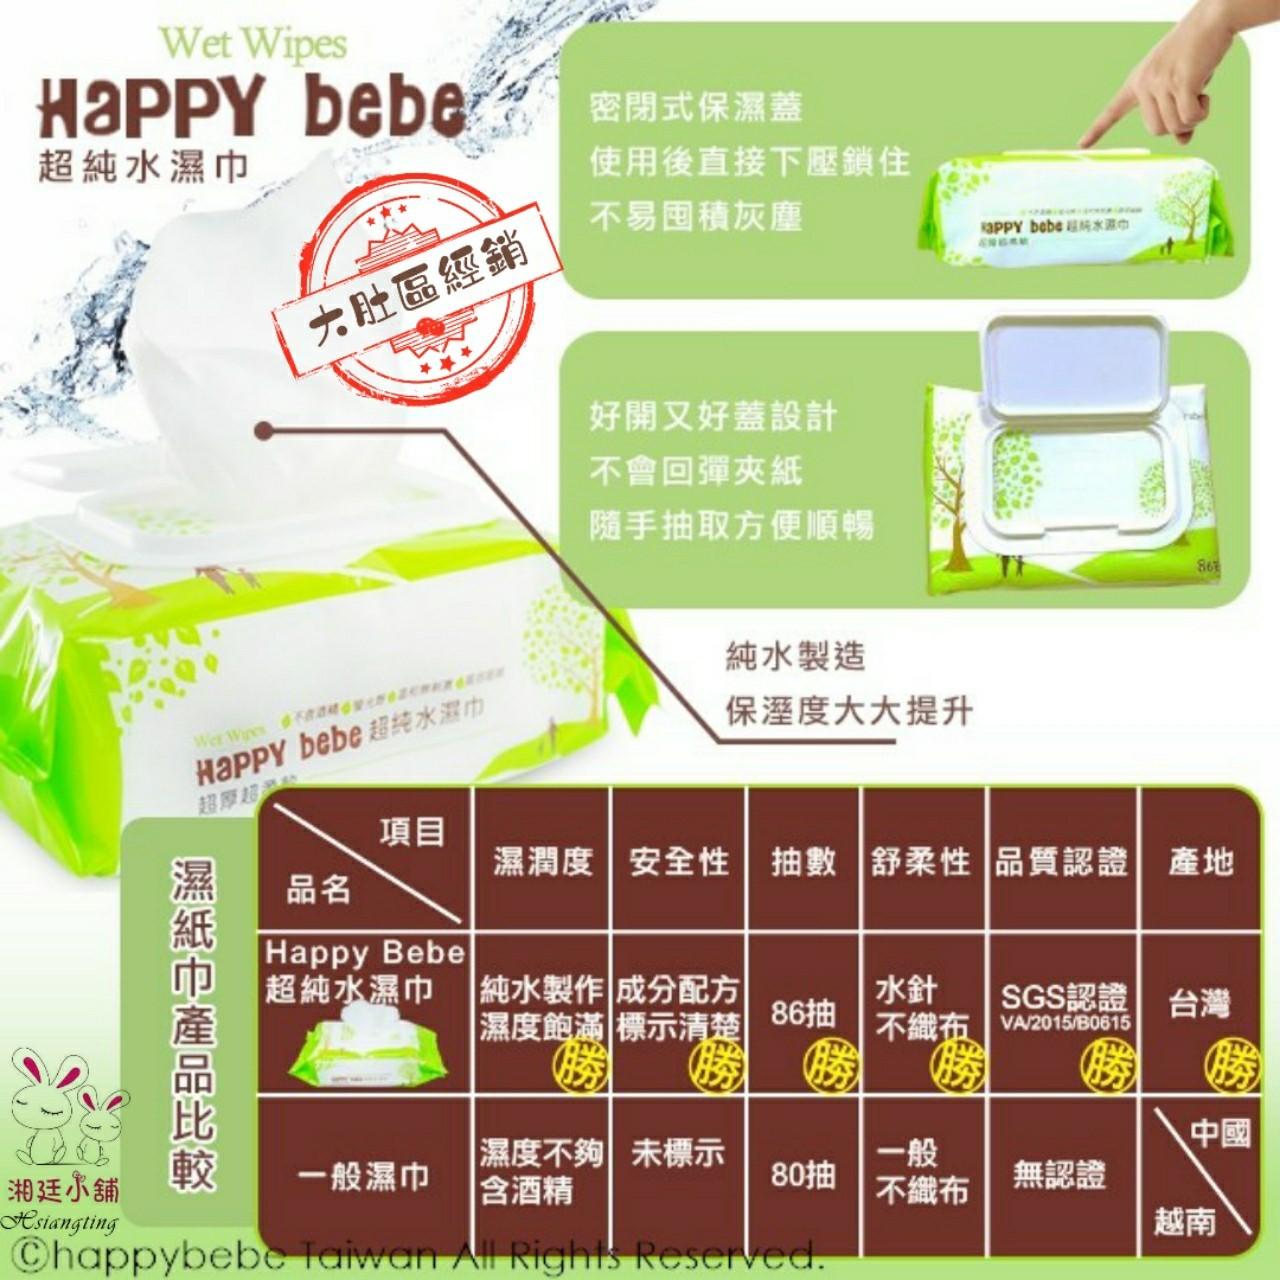 HAPPYBEBE~超純水濕紙巾(有蓋款) 台灣製